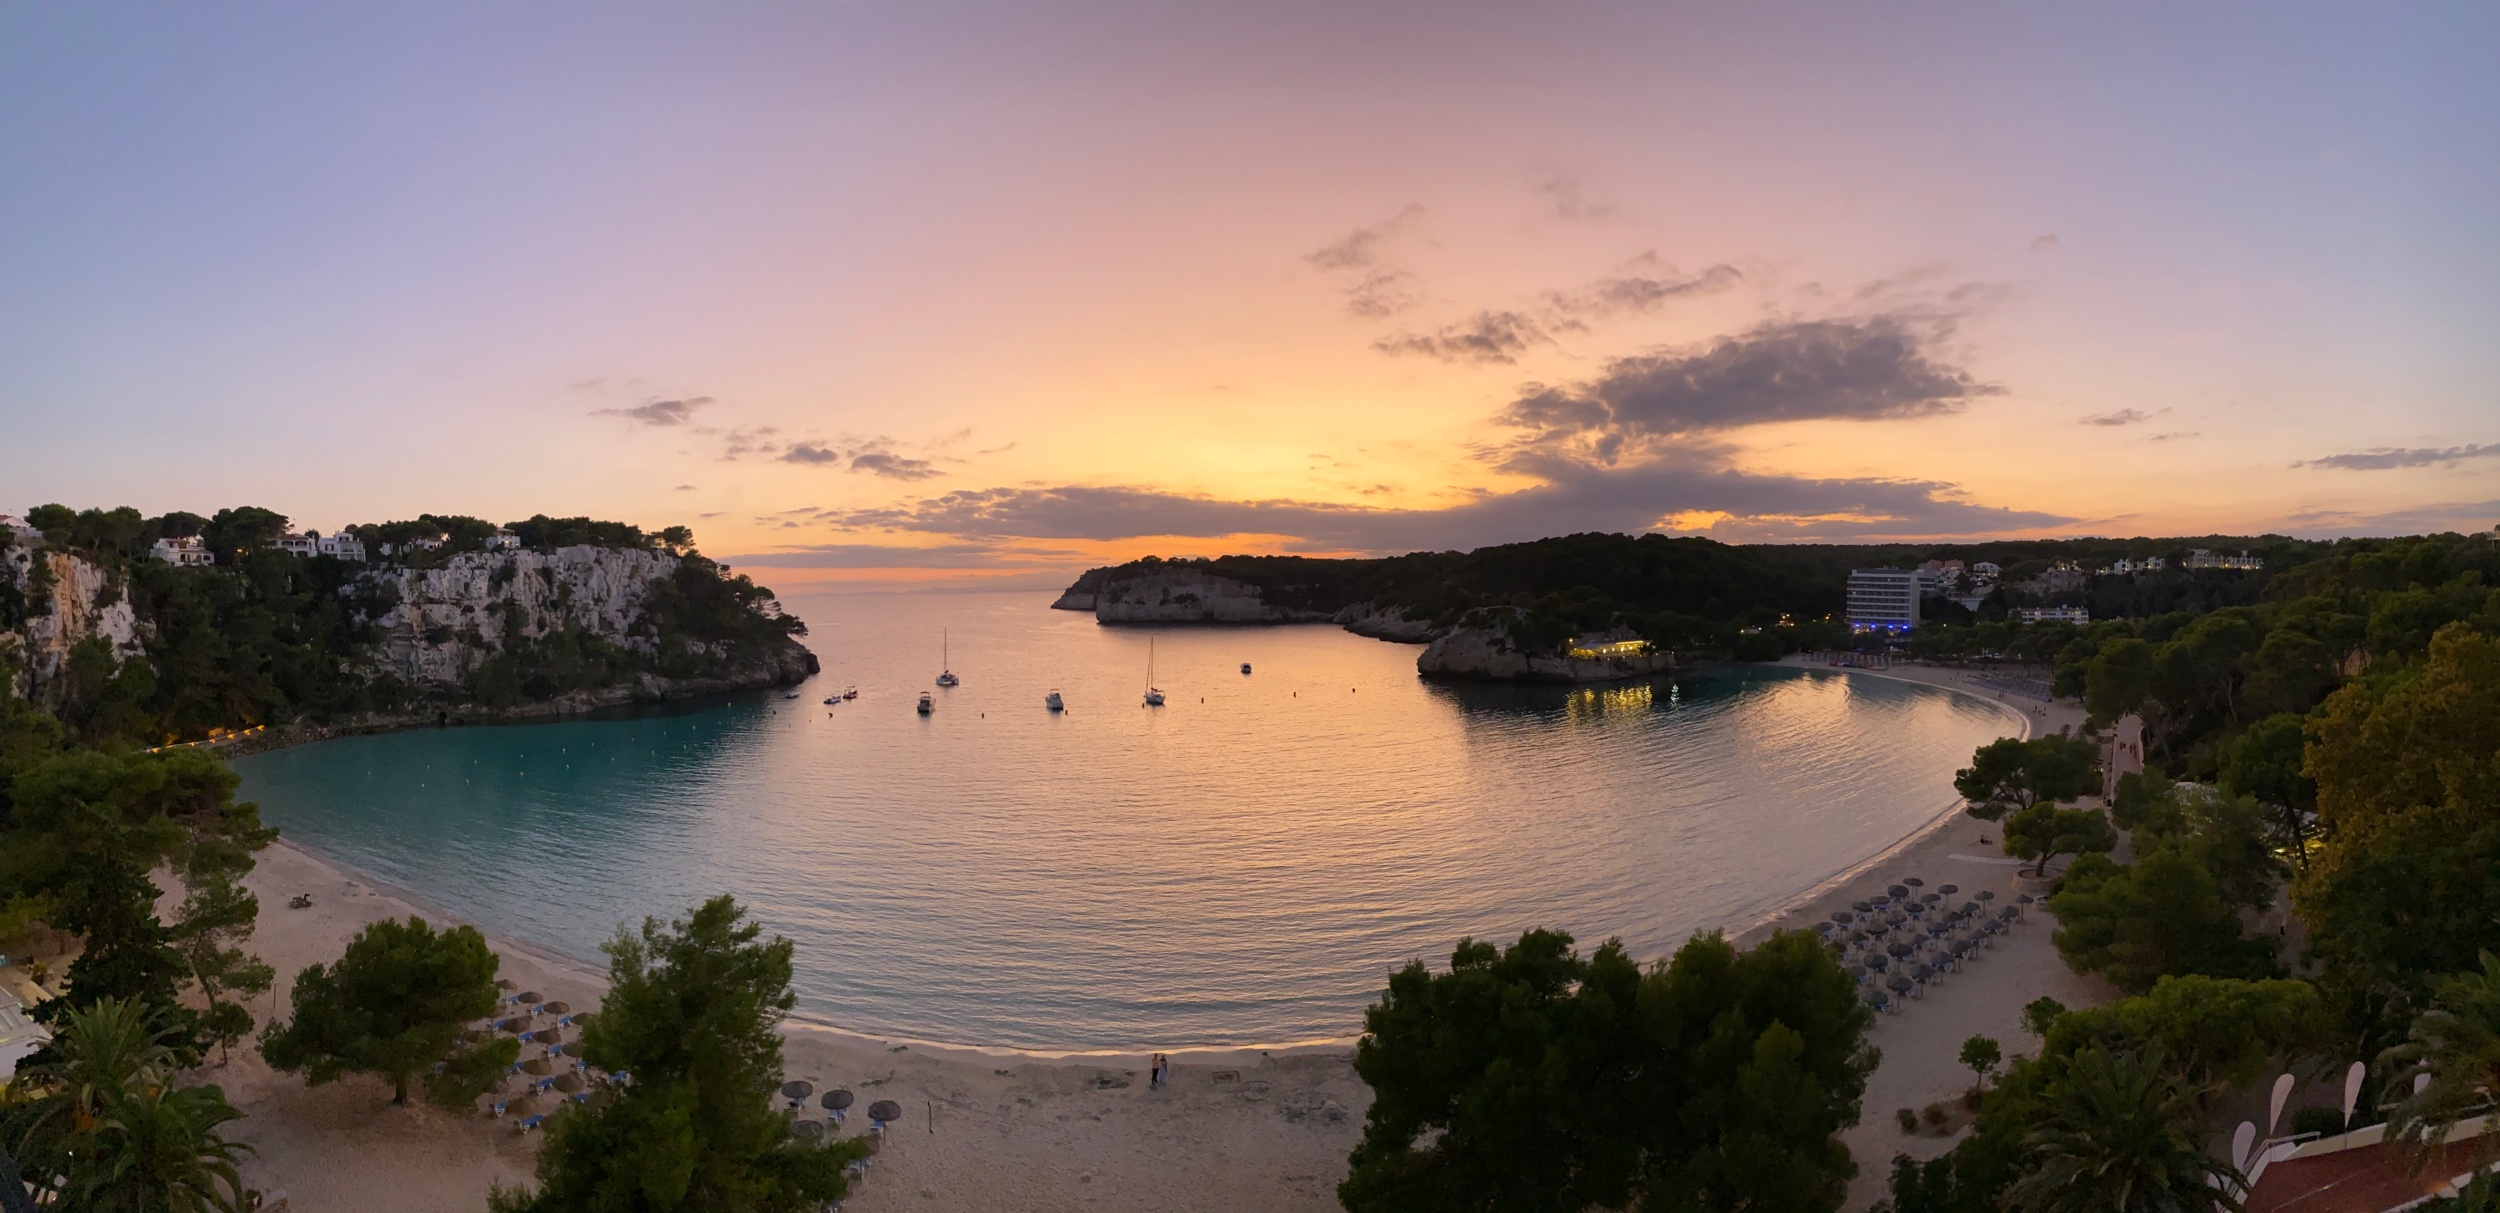 The full iPhone panorama.